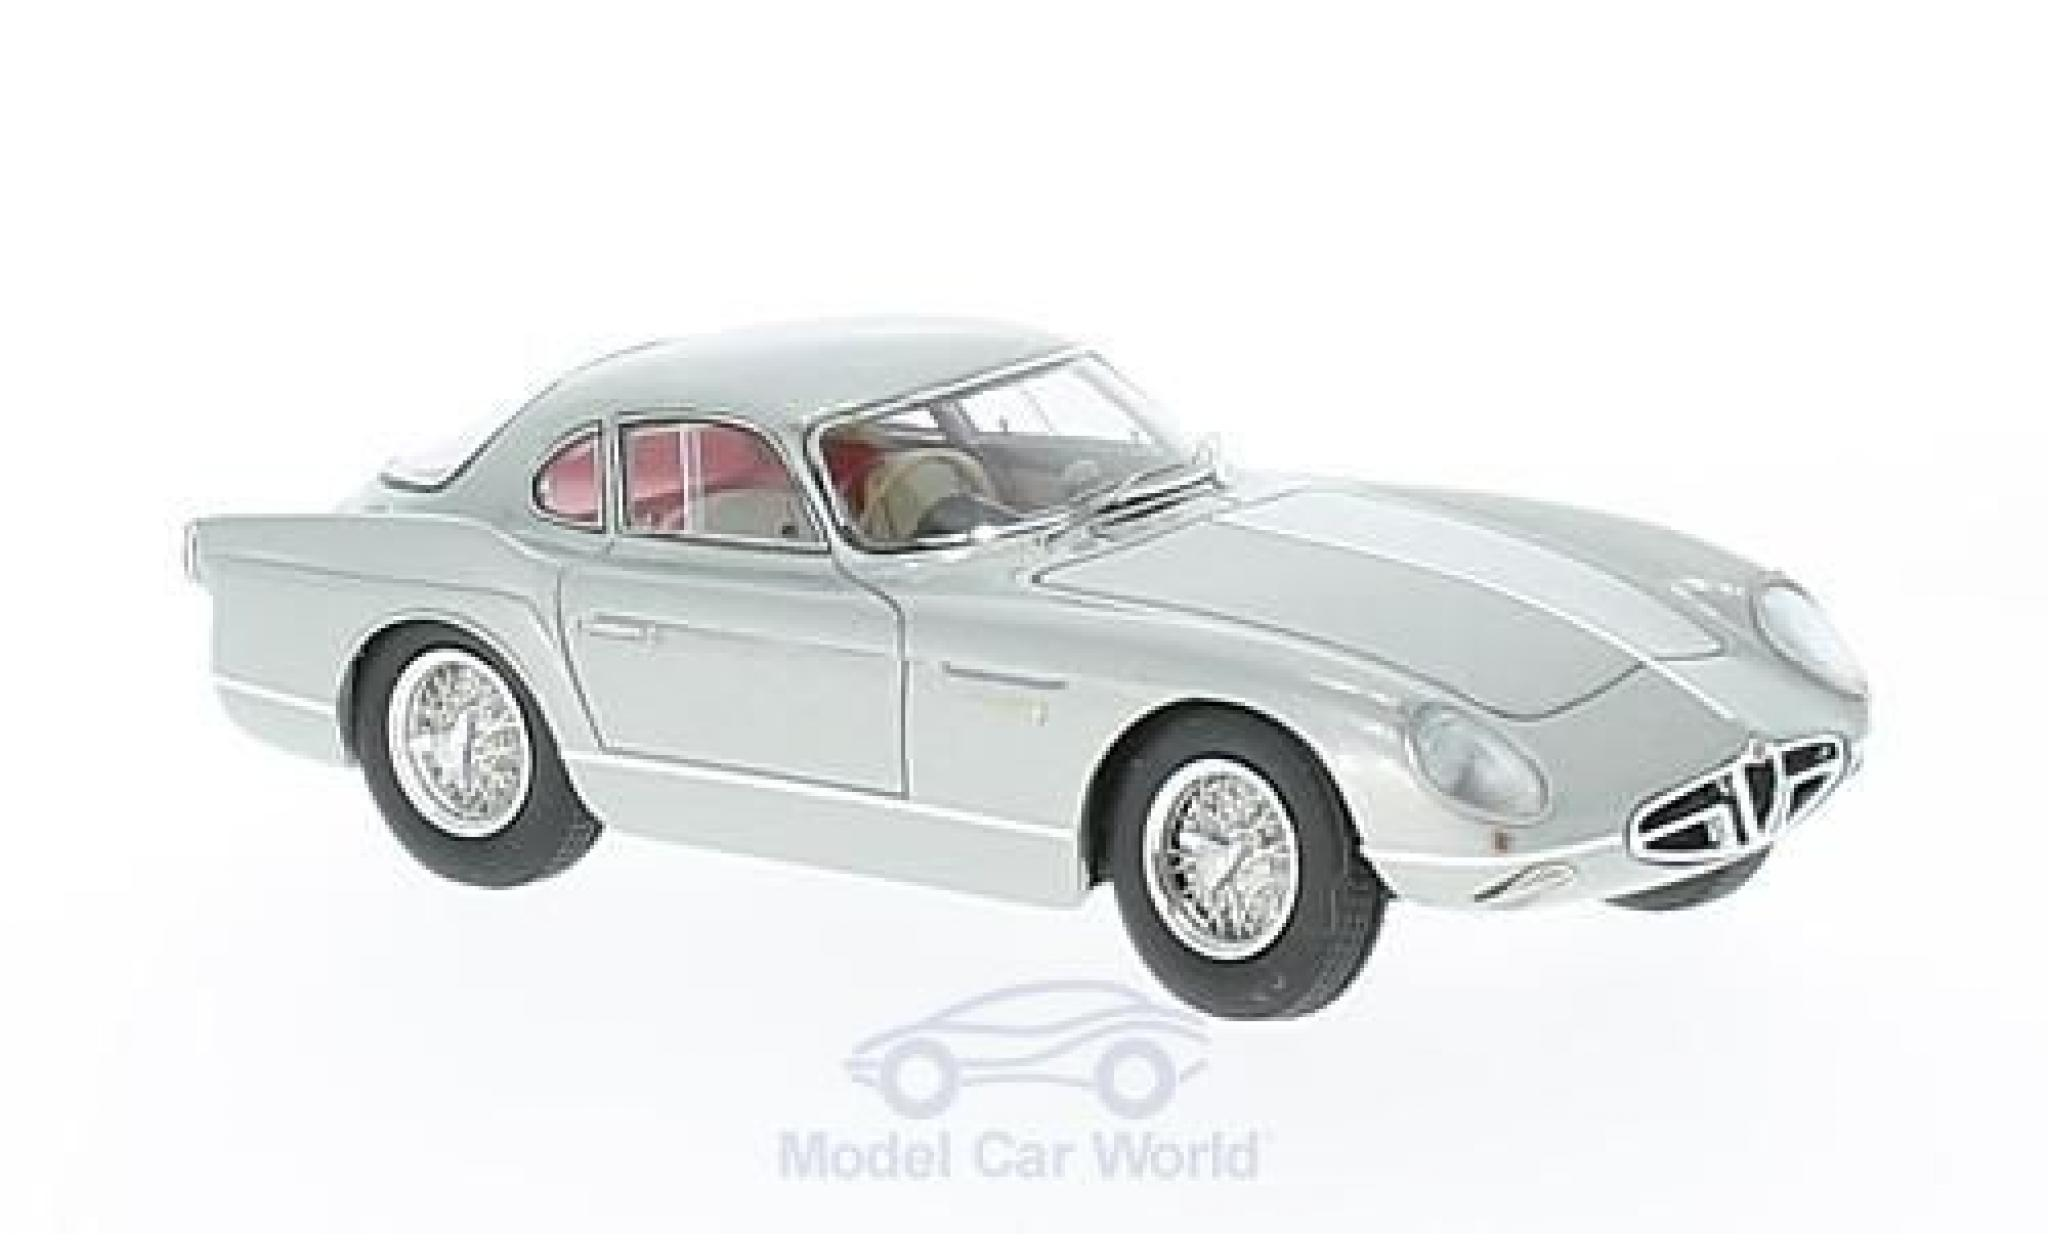 Alfa Romeo 2000 1/43 Matrix Sportiva Coupe Bertone grise RHD 1954